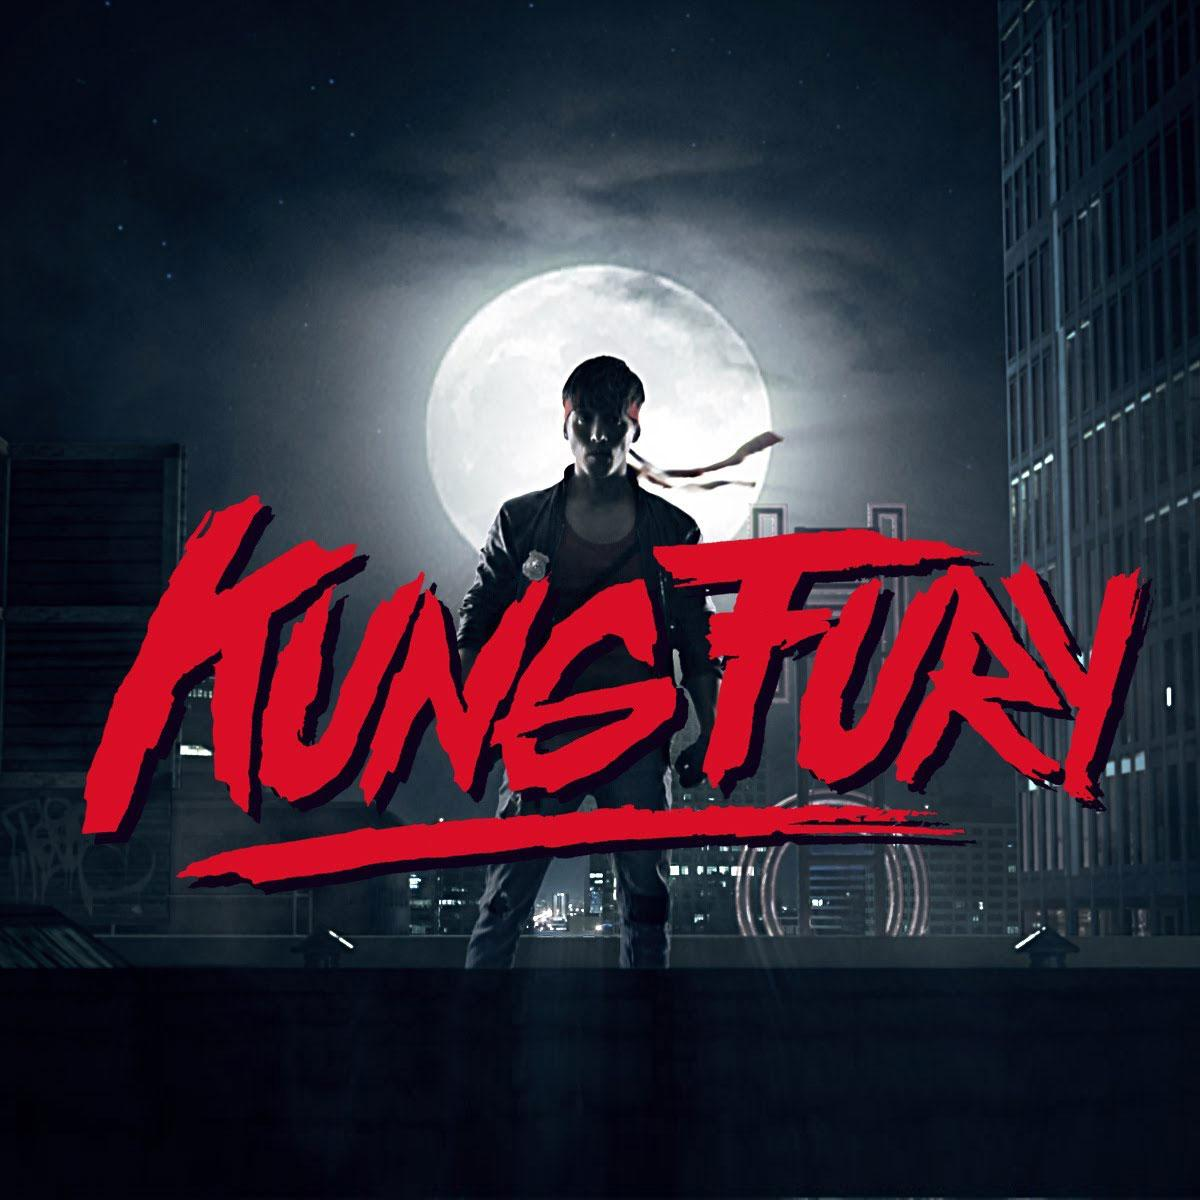 http://www.kickstarter.com/projects/kungfury/kung-fury